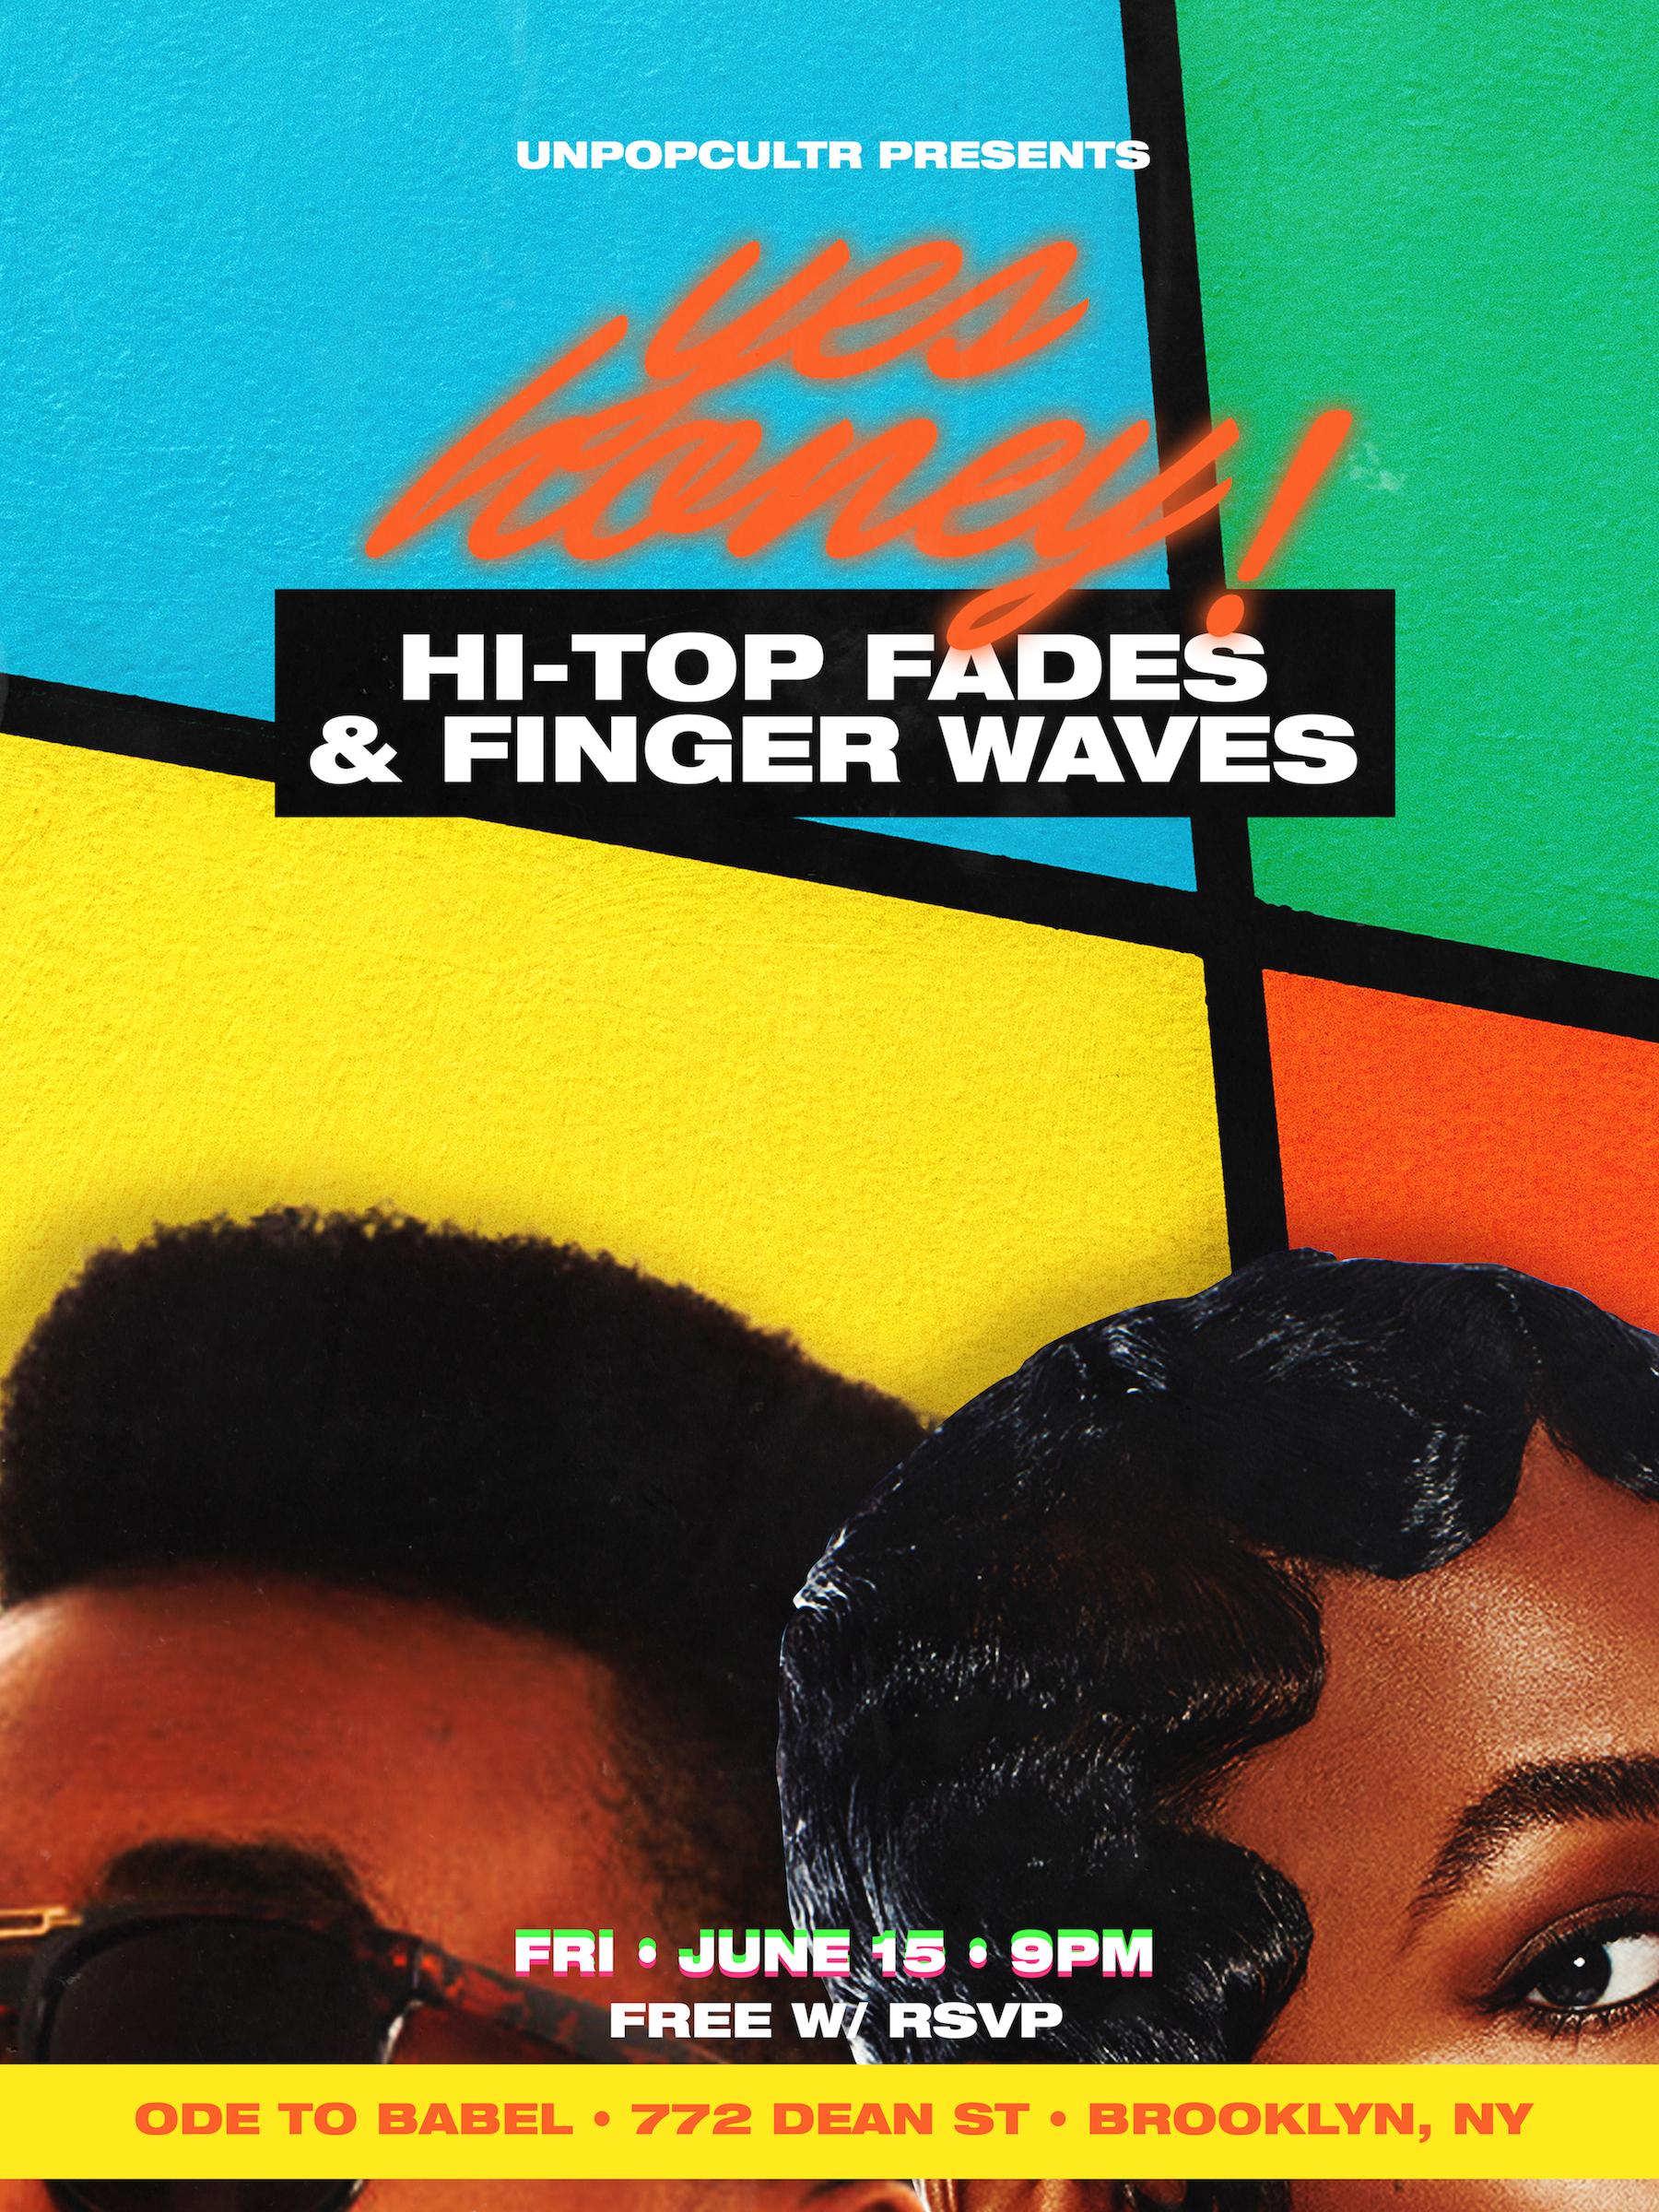 'Yes Honey Hi-Top Fades and Finger Waves' flyer-2.jpg